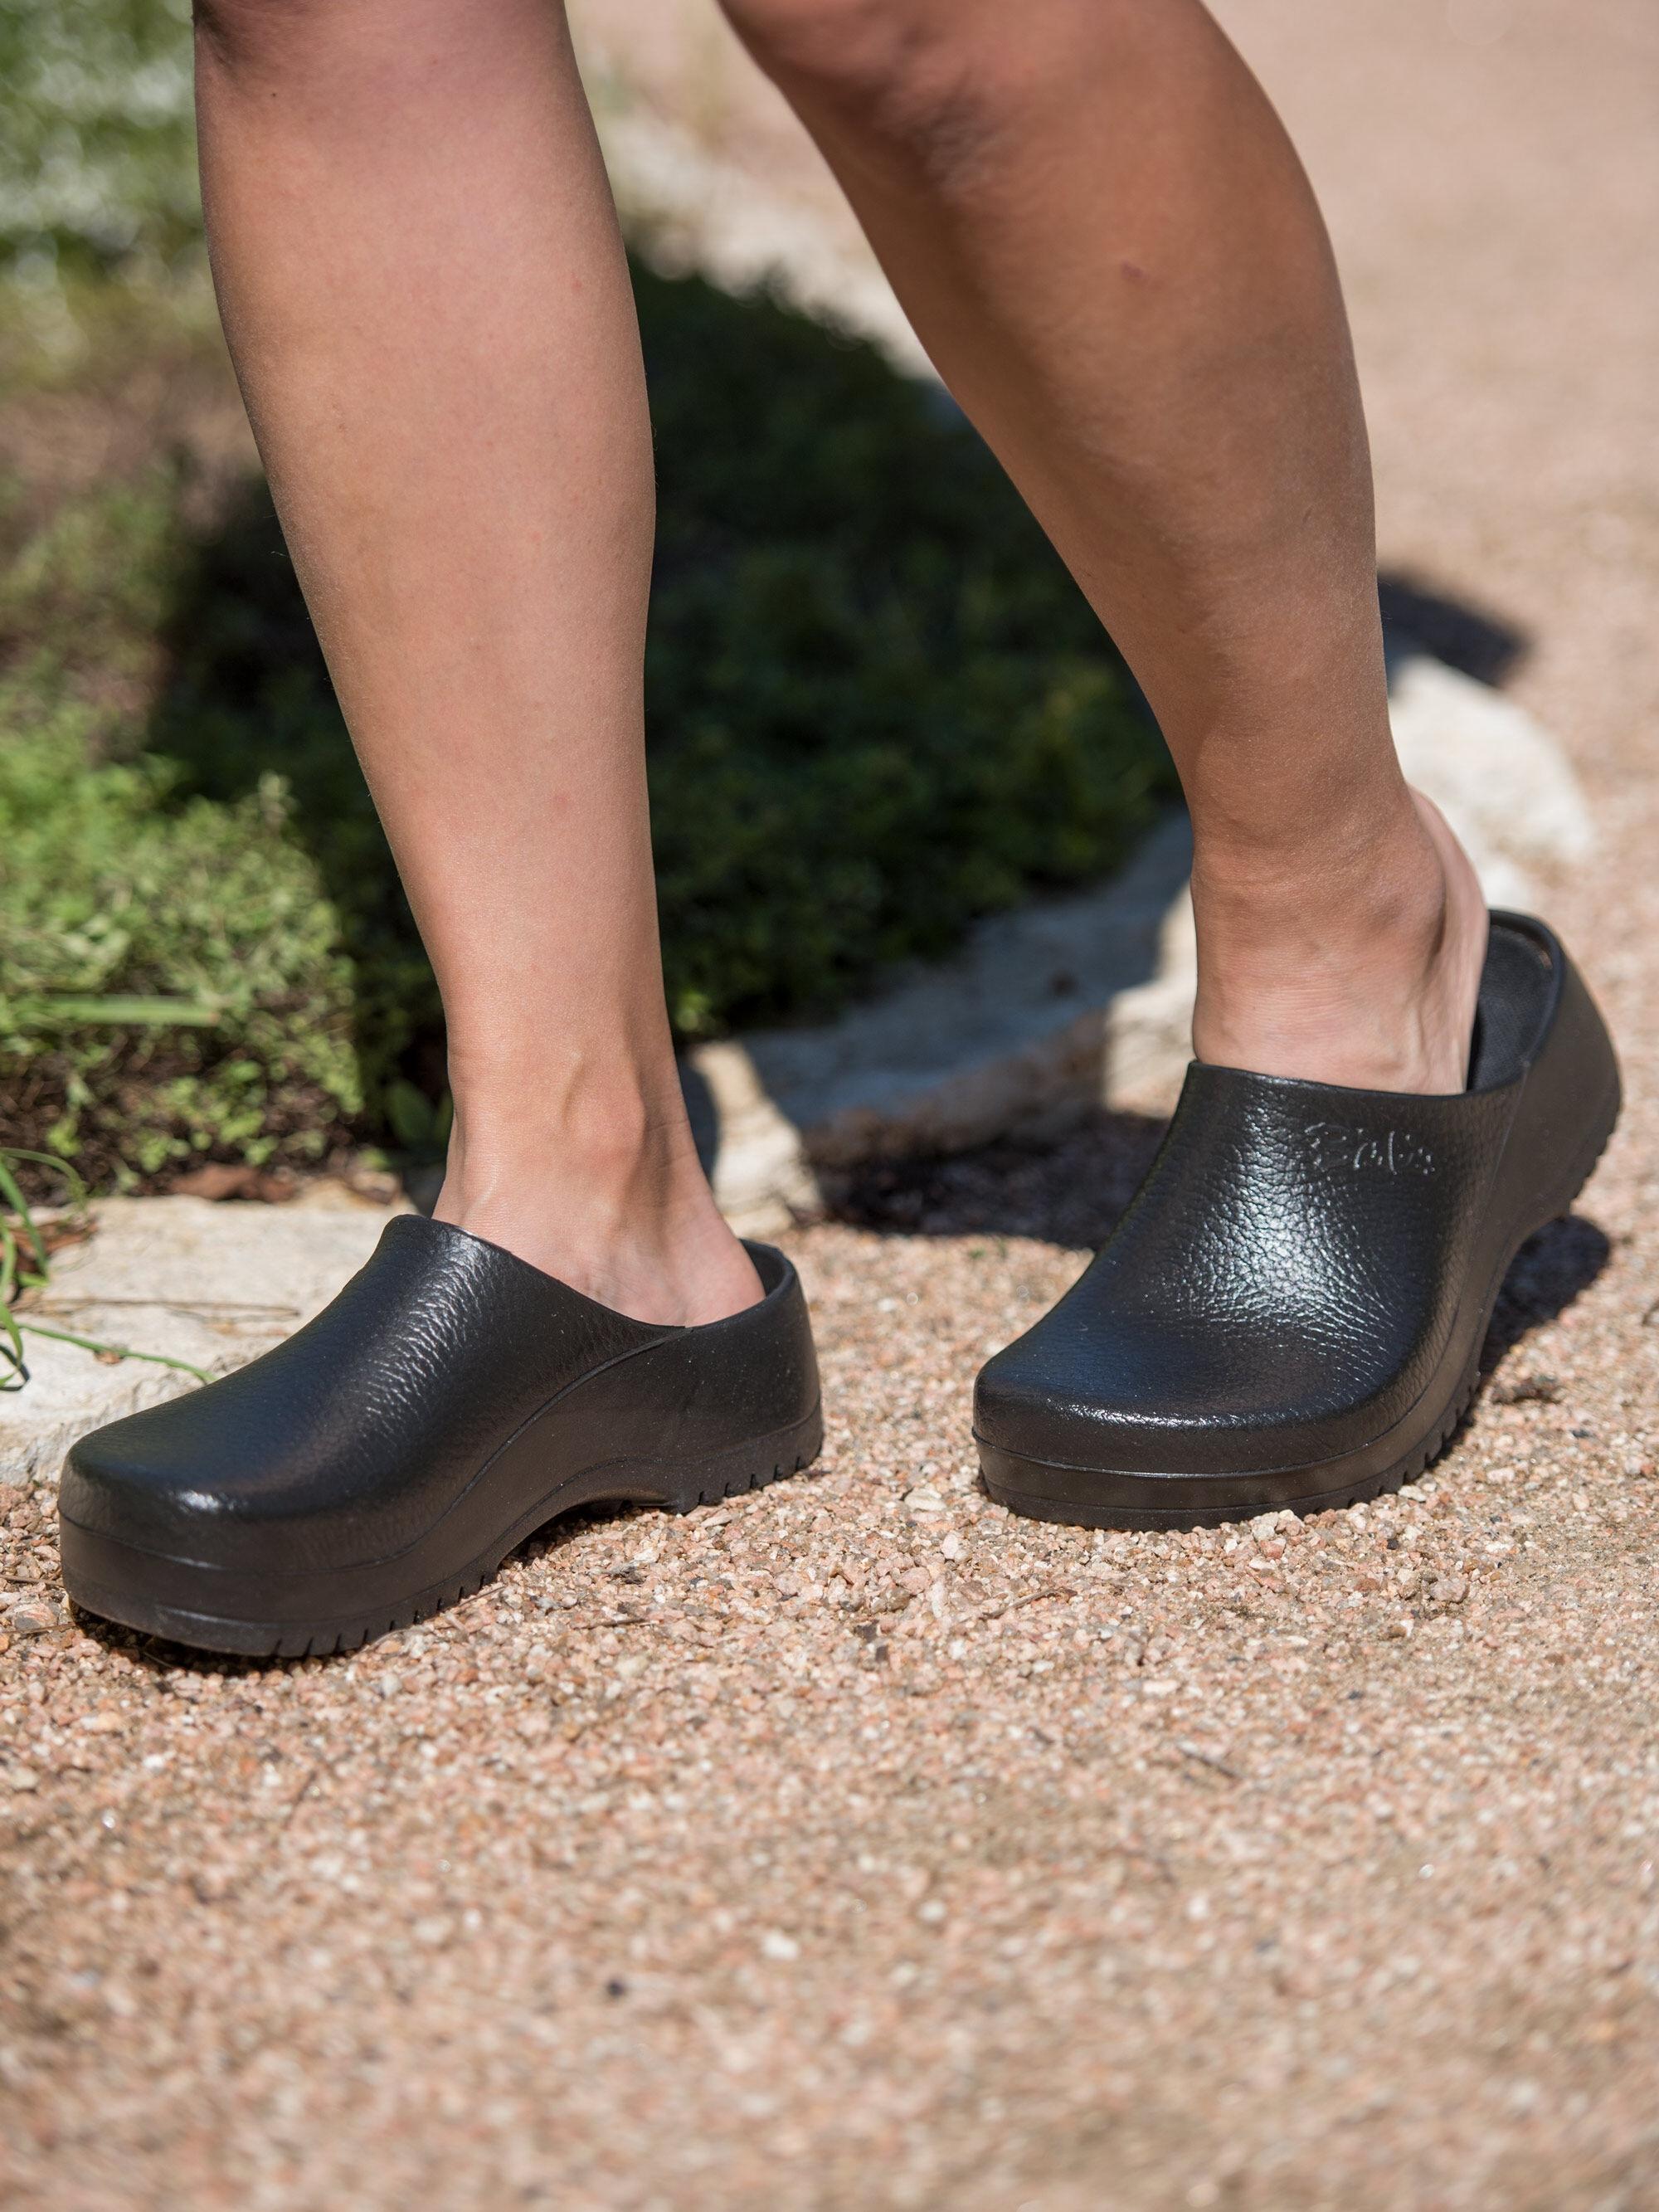 birkis shoes